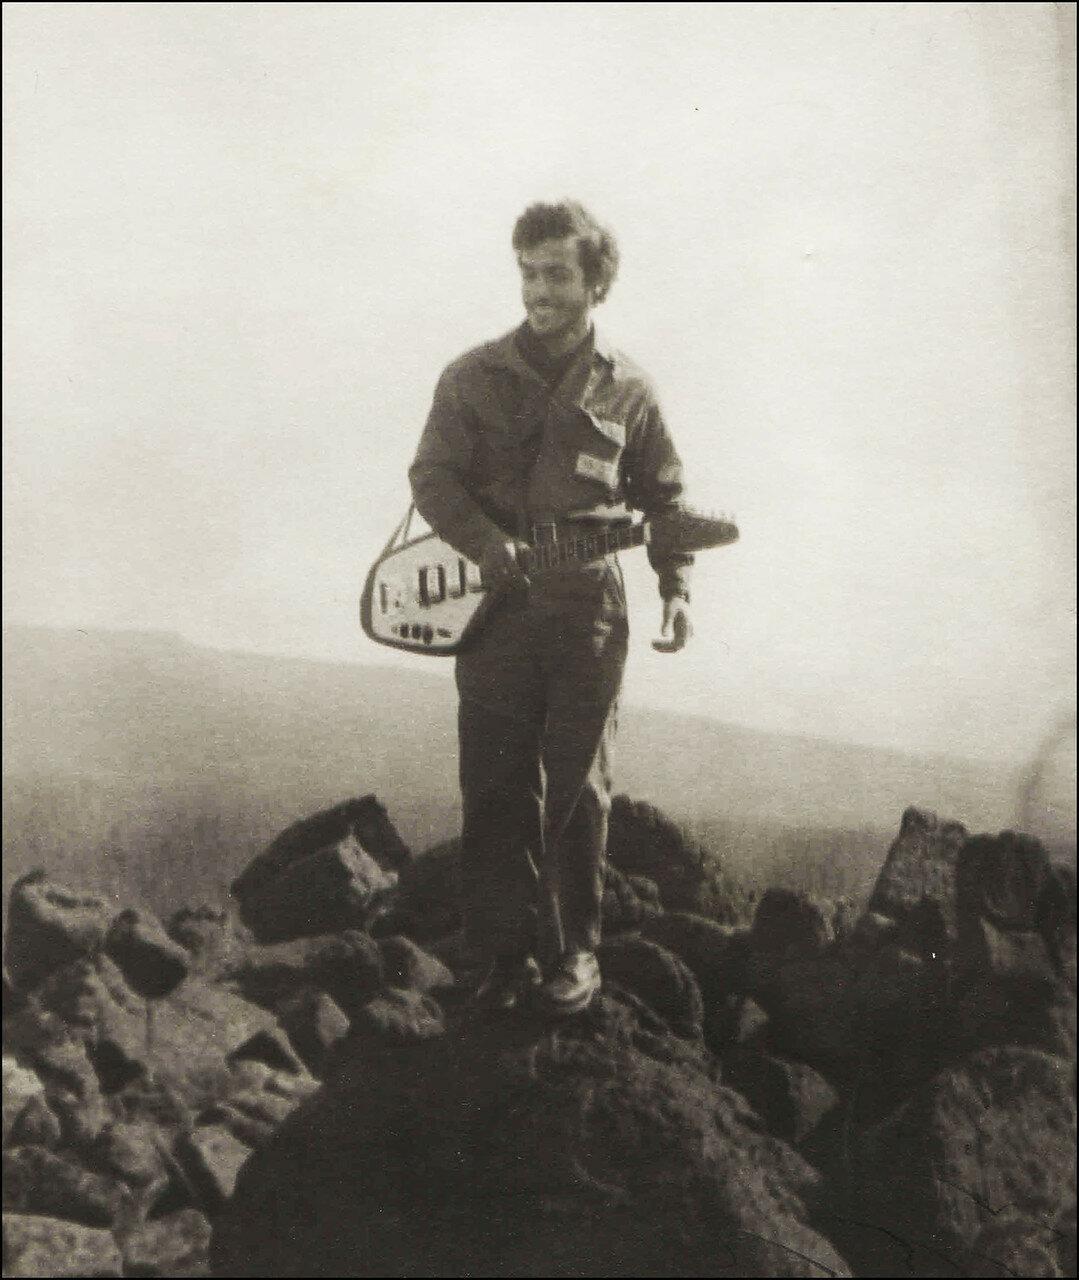 1969. Ашот Налбандян (ЭТ-66) на скалах. Якутия